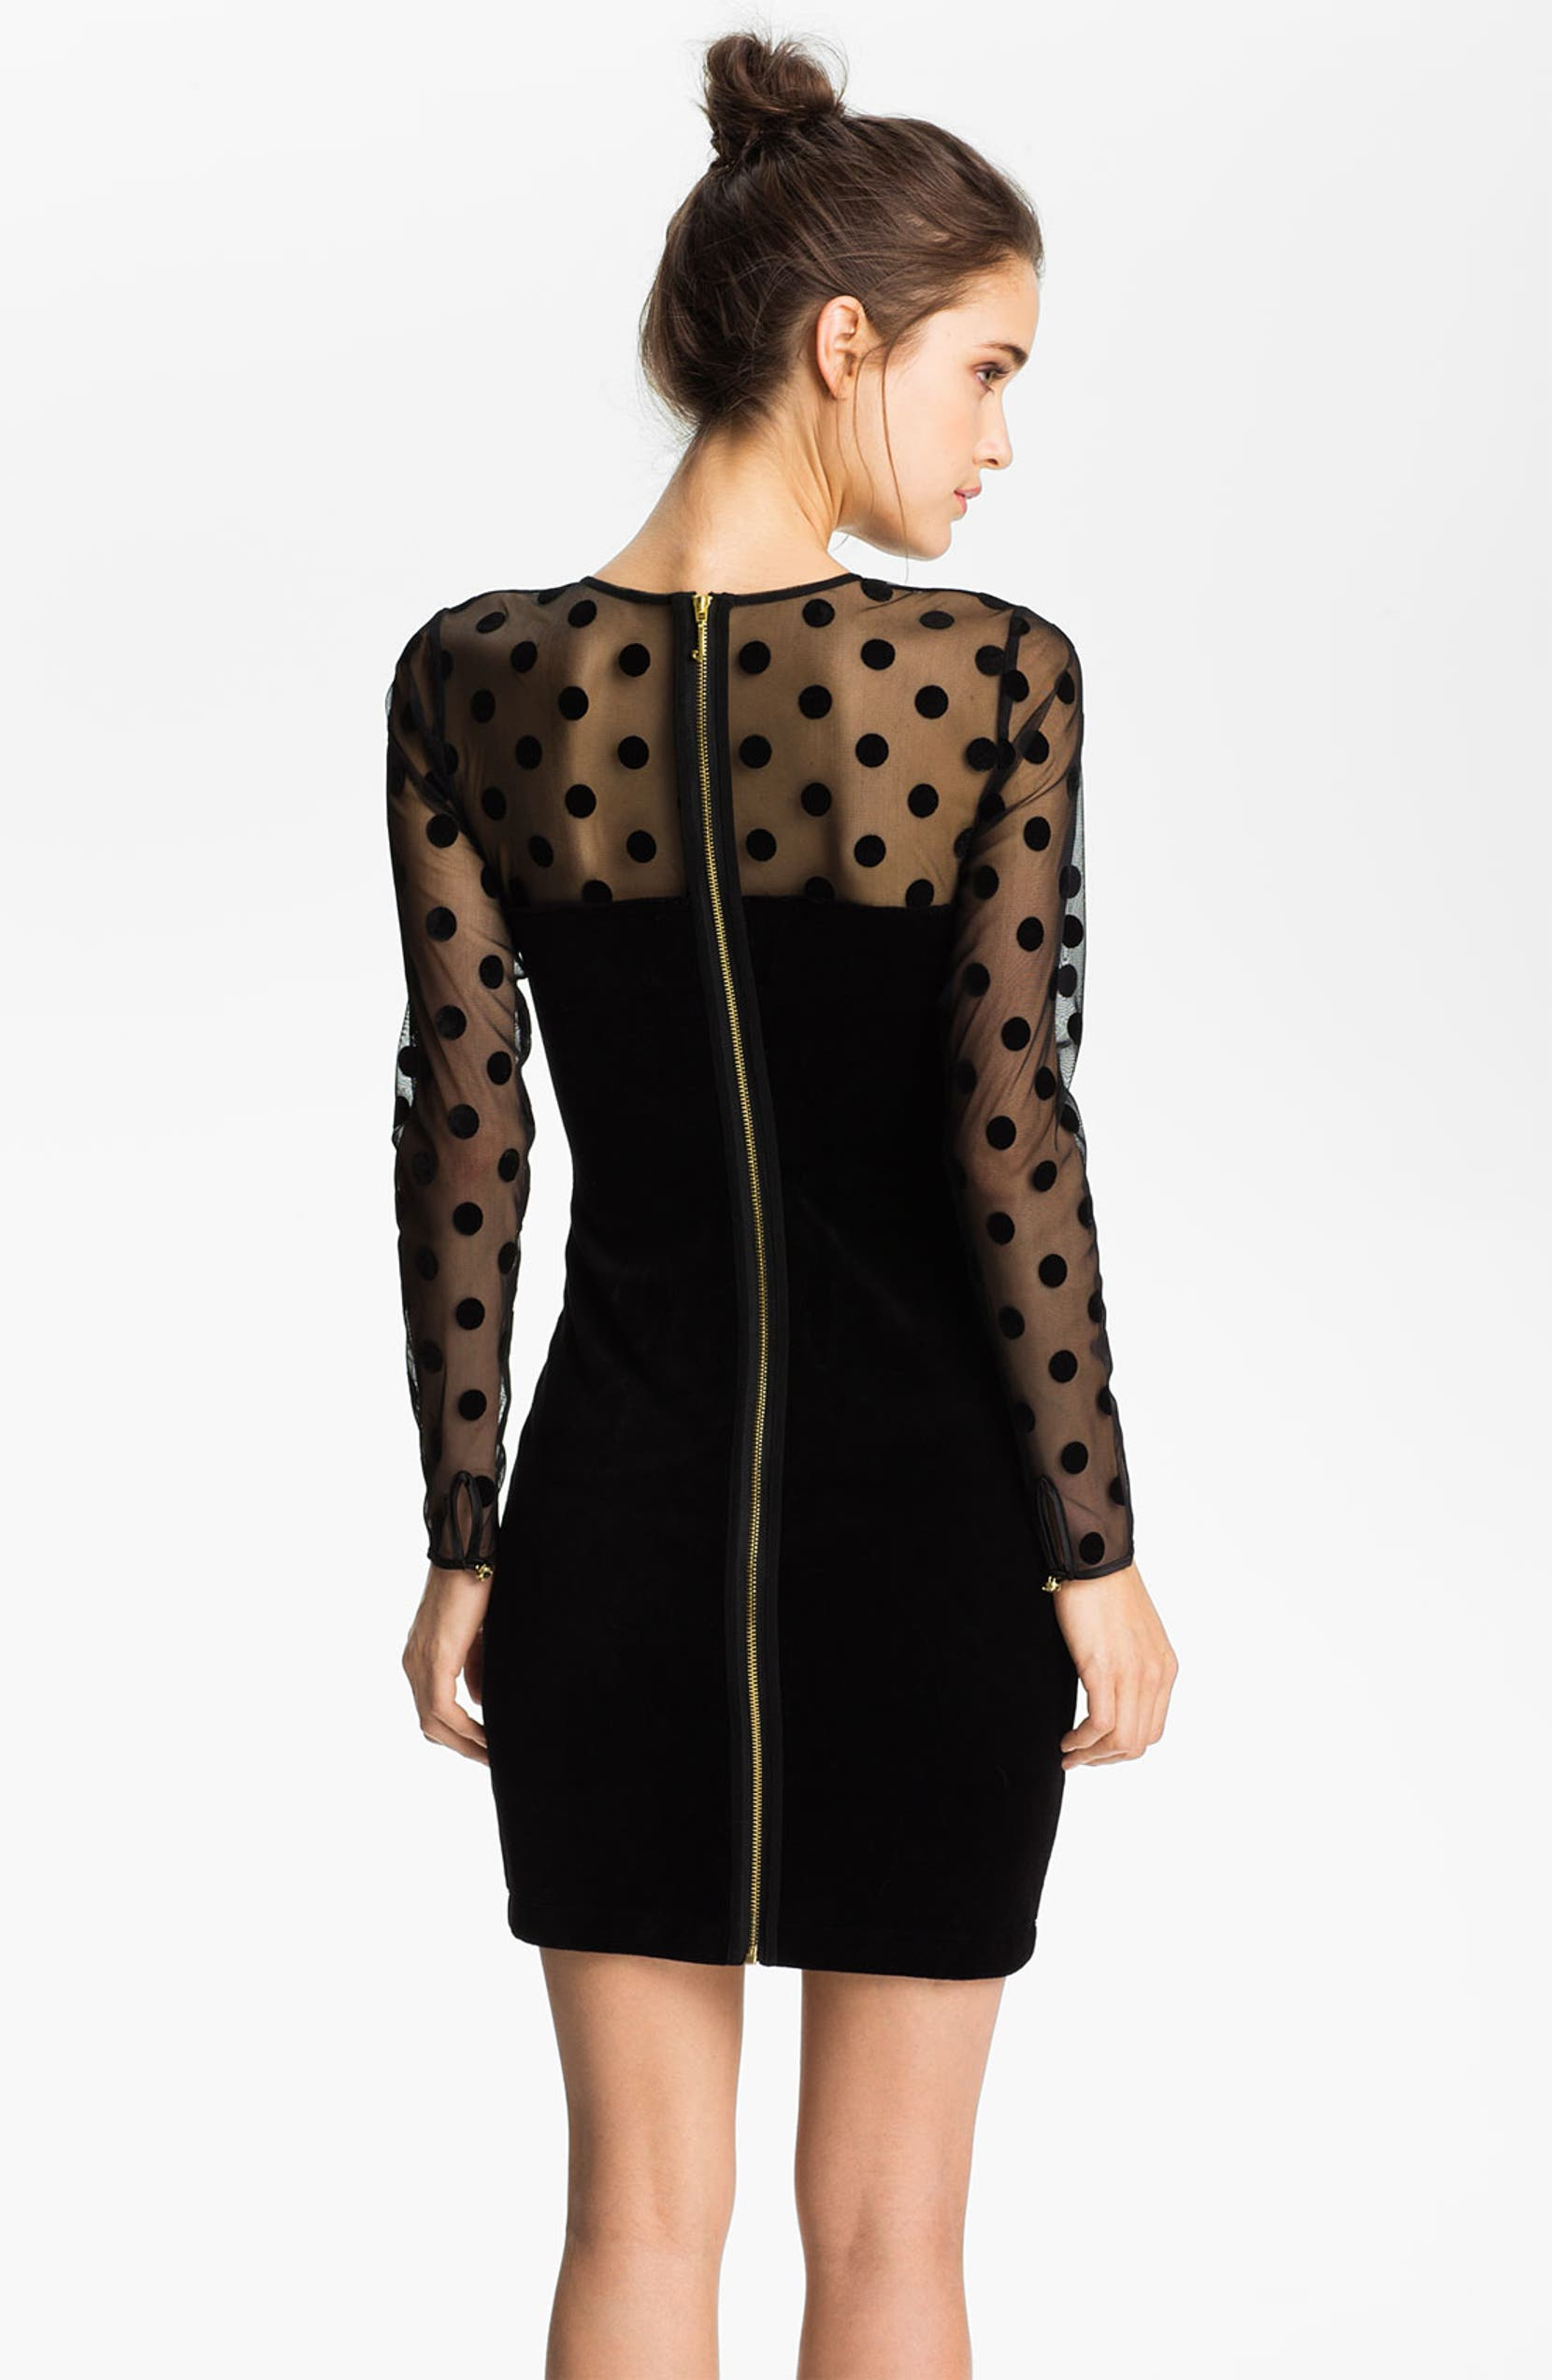 Juicy Couture Sheer Polka Dot   Velvet Dress  11f6a6e23